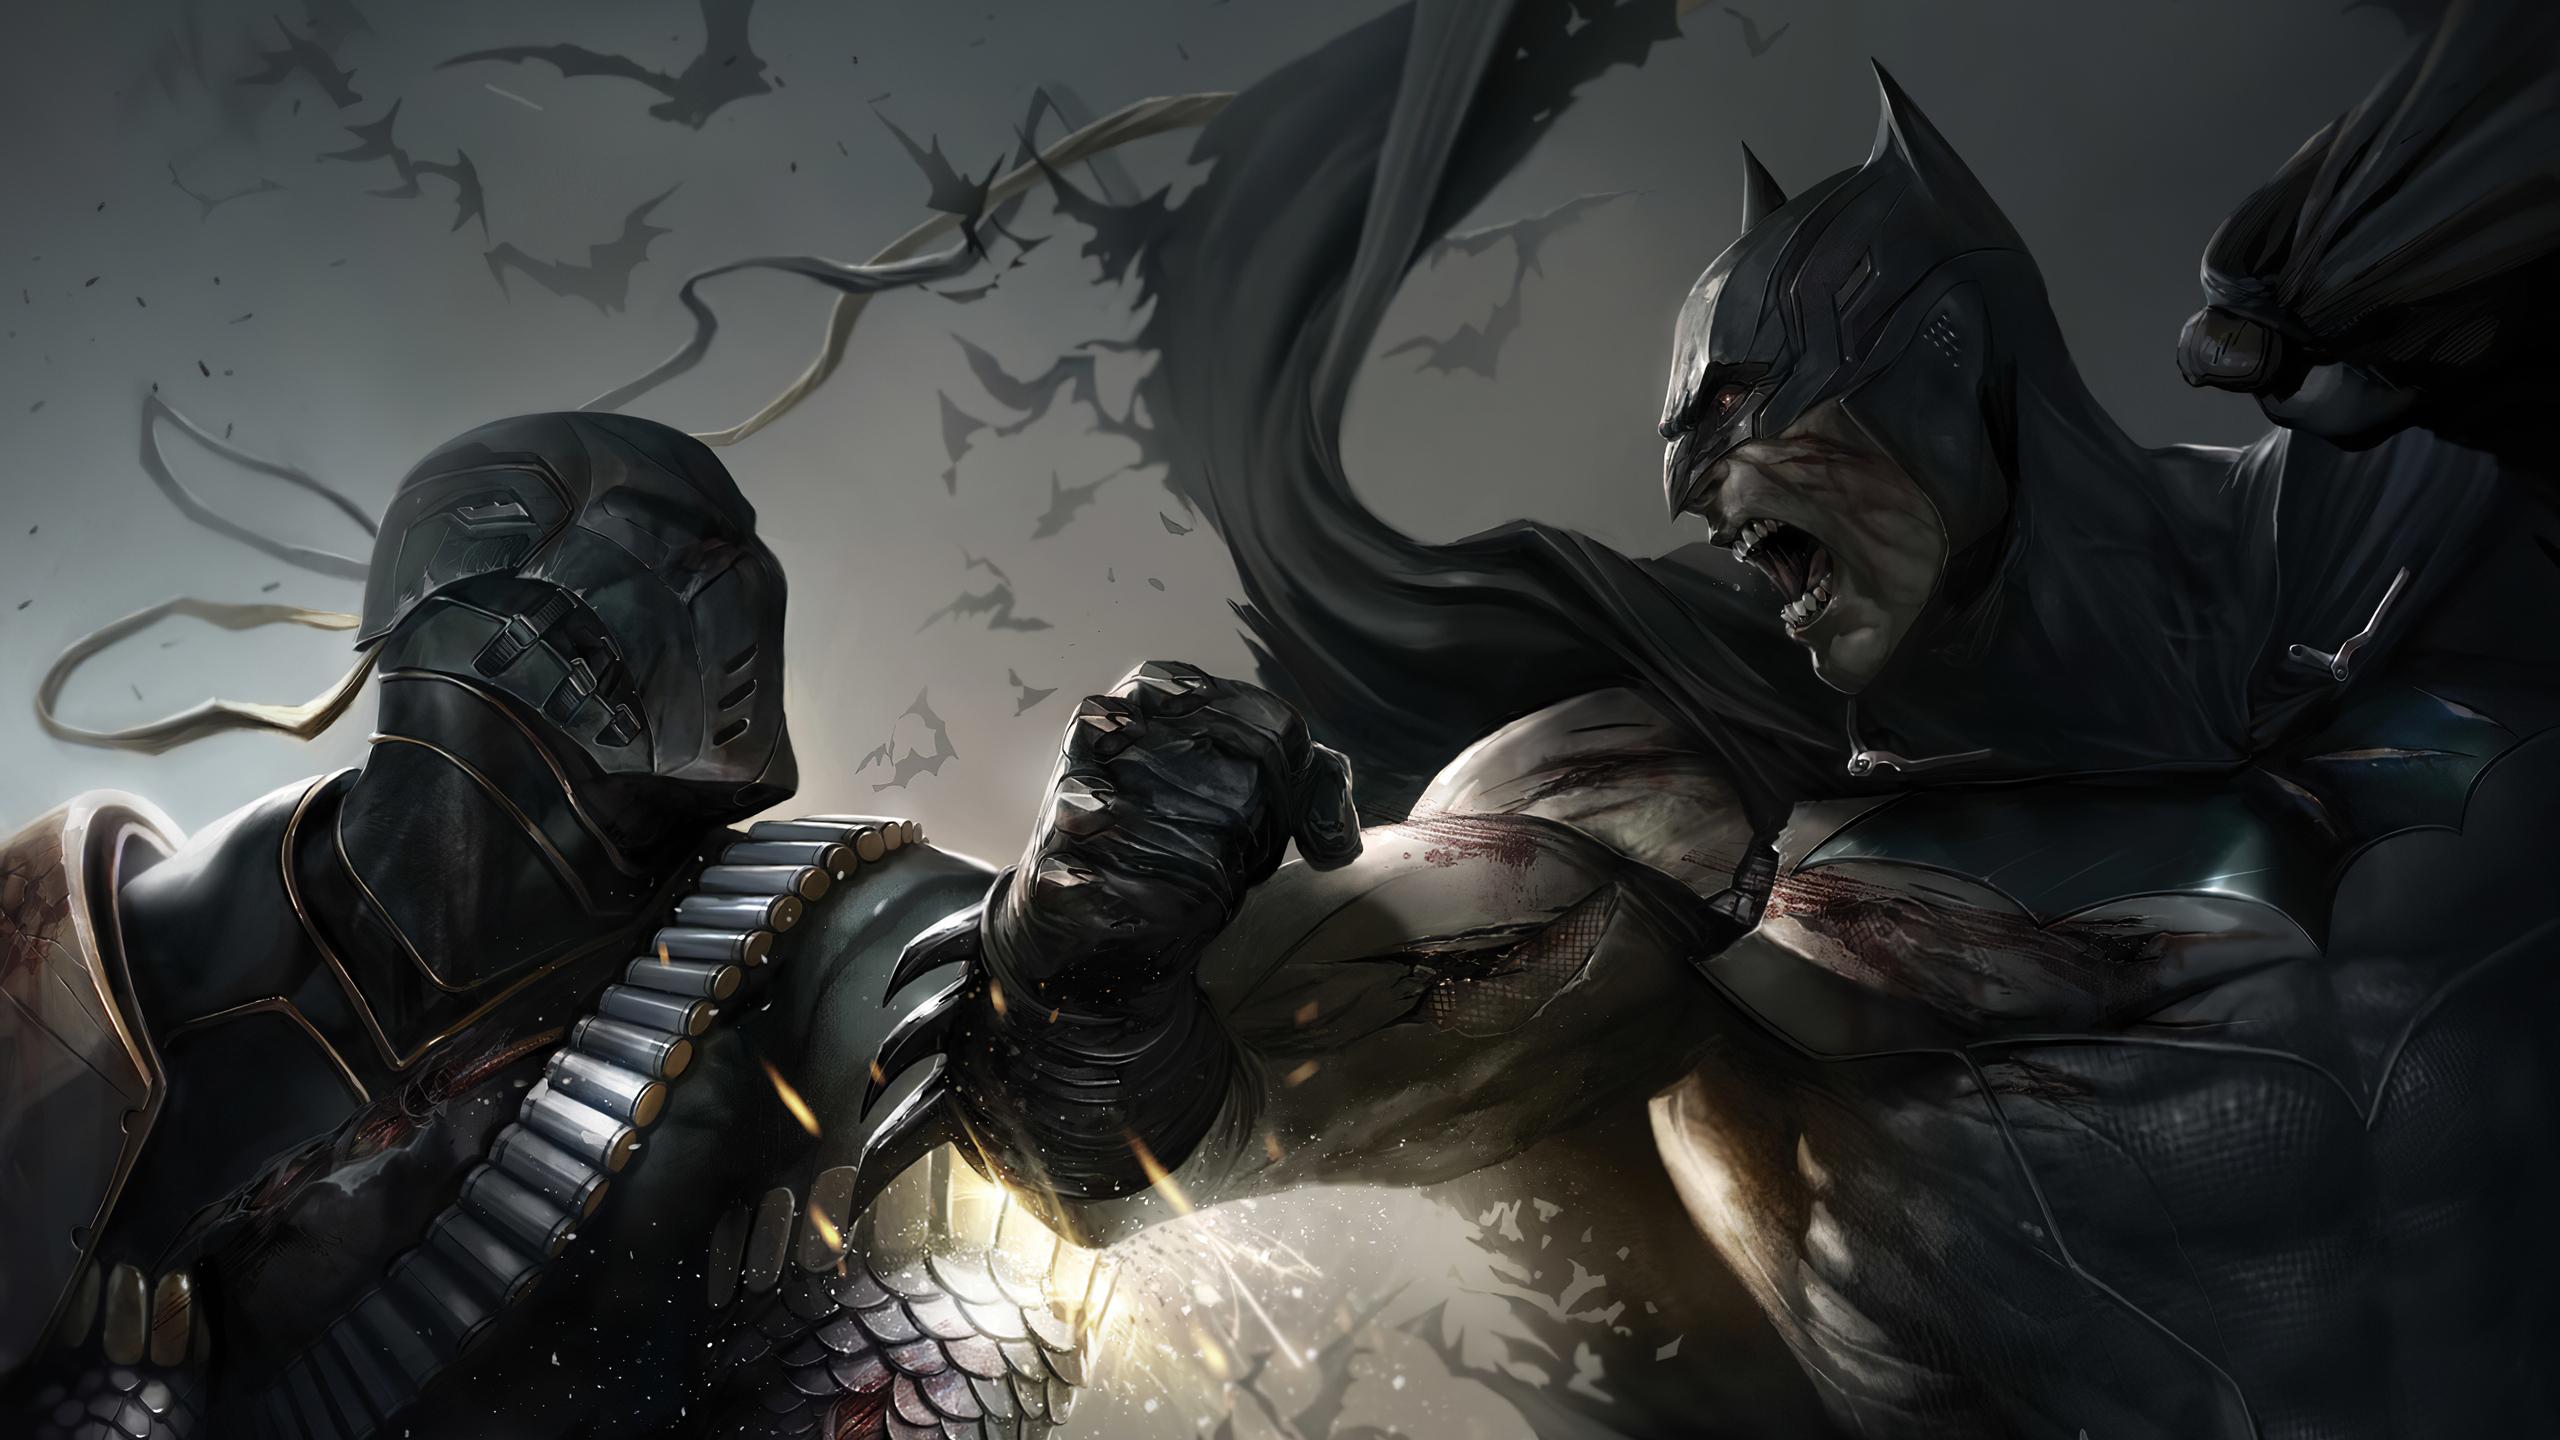 batman-and-deathstroke-4k-2020-1b.jpg